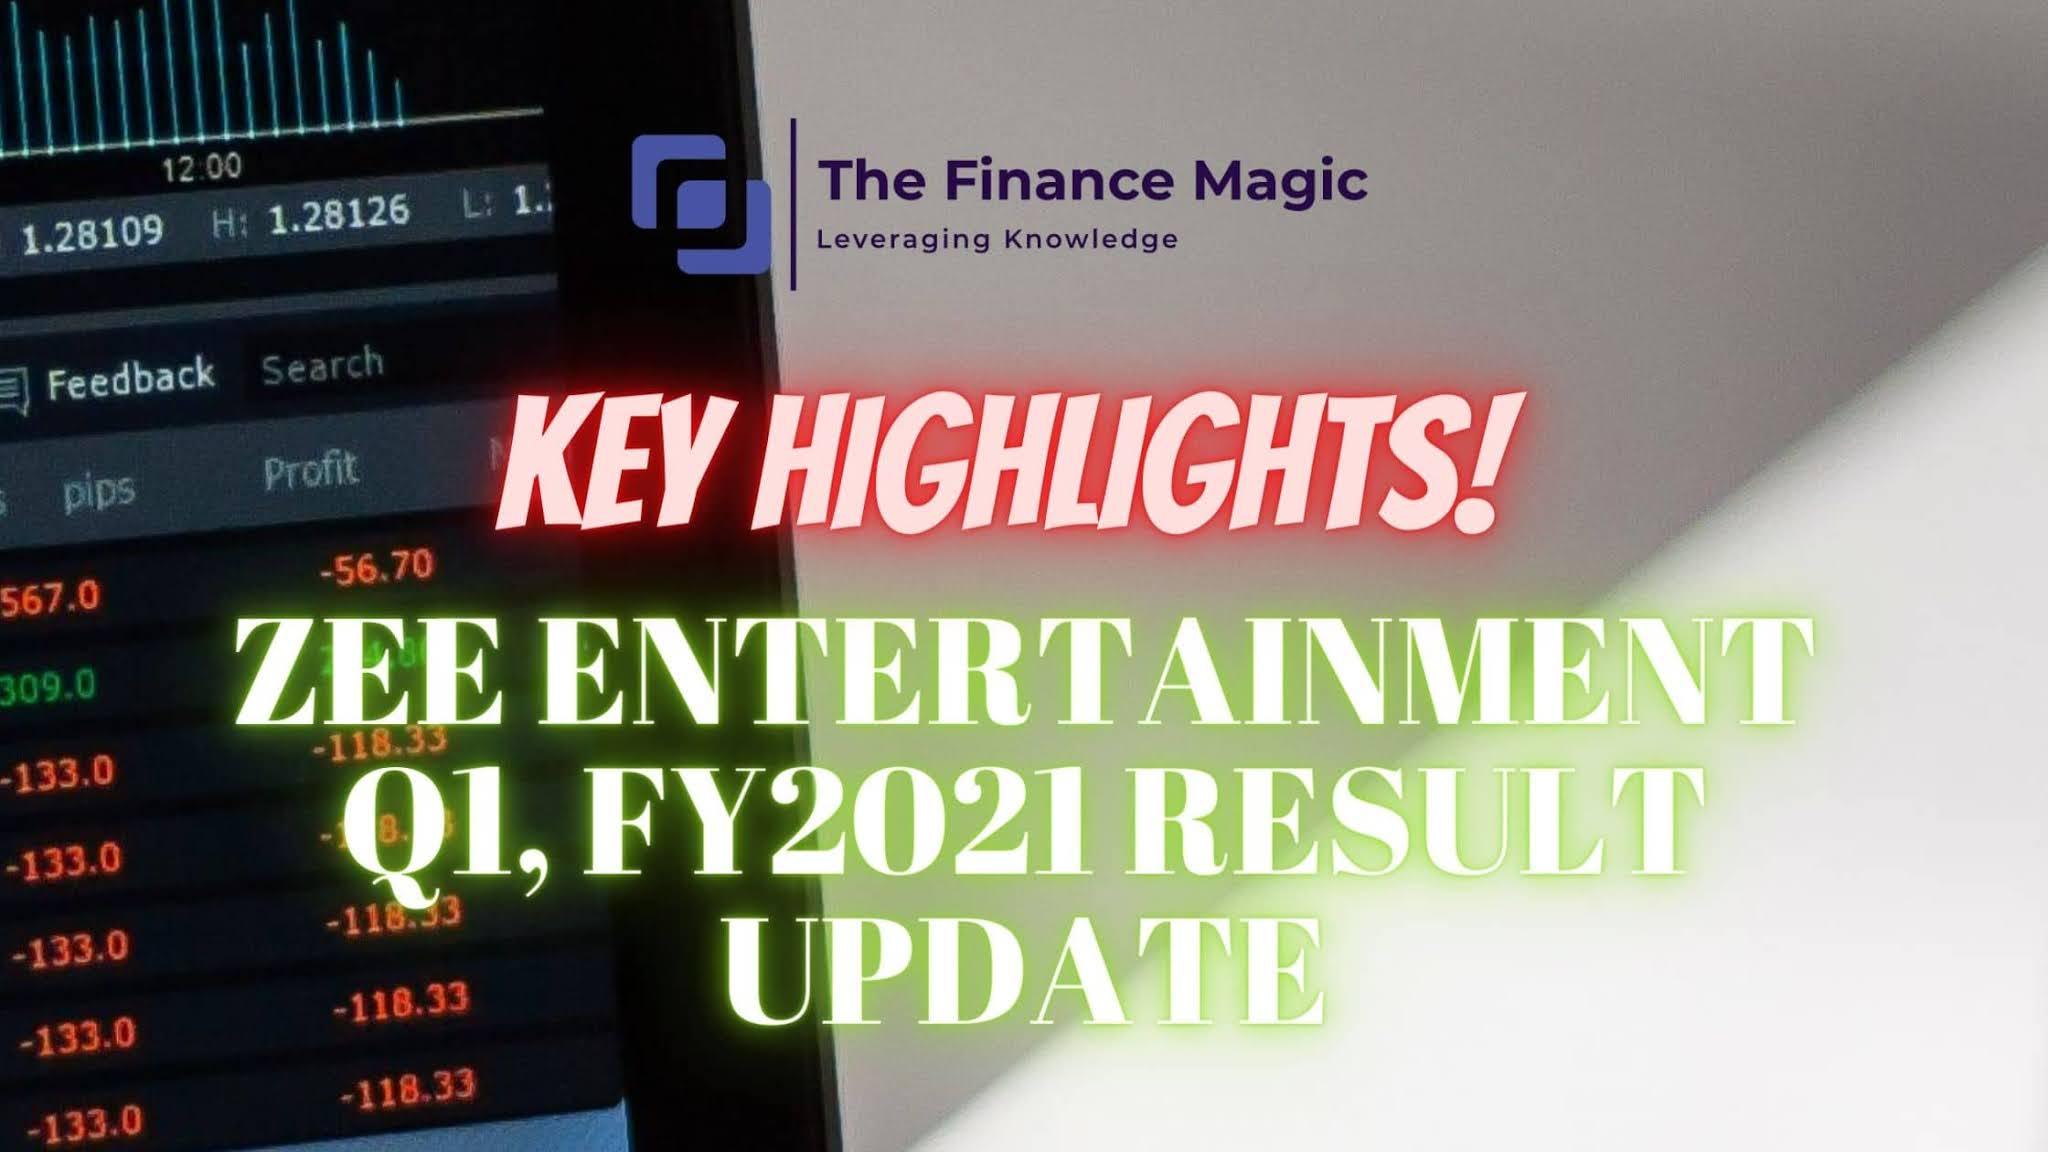 Zee Entertainment Q1, FY2021 Result Update